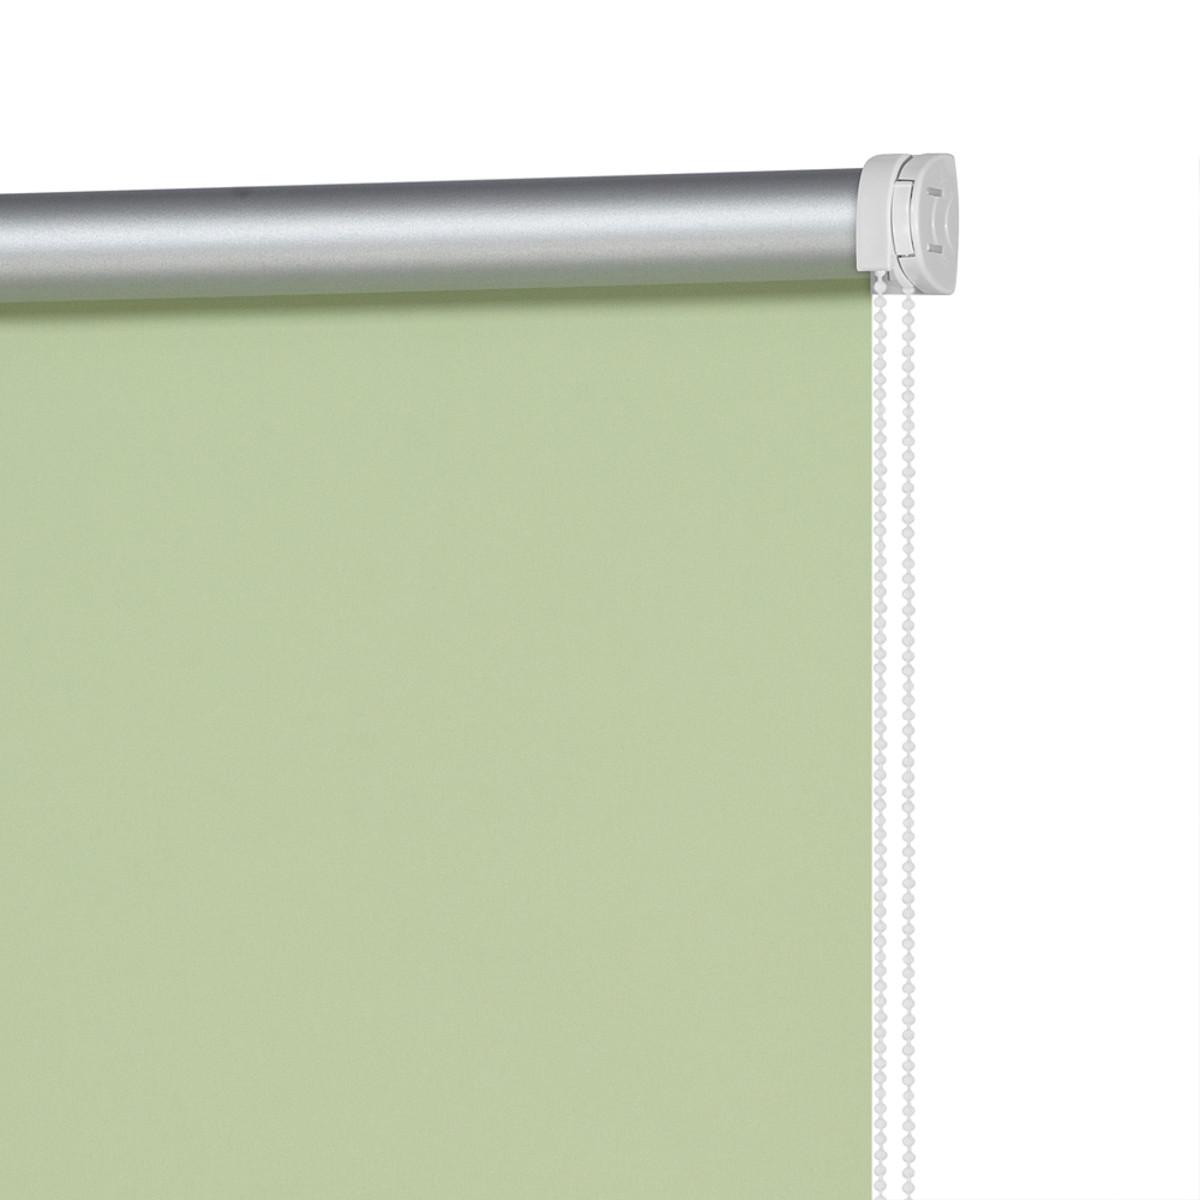 Рулонная Ора Decofest Плайн 120Х160 Цвет Зеленый